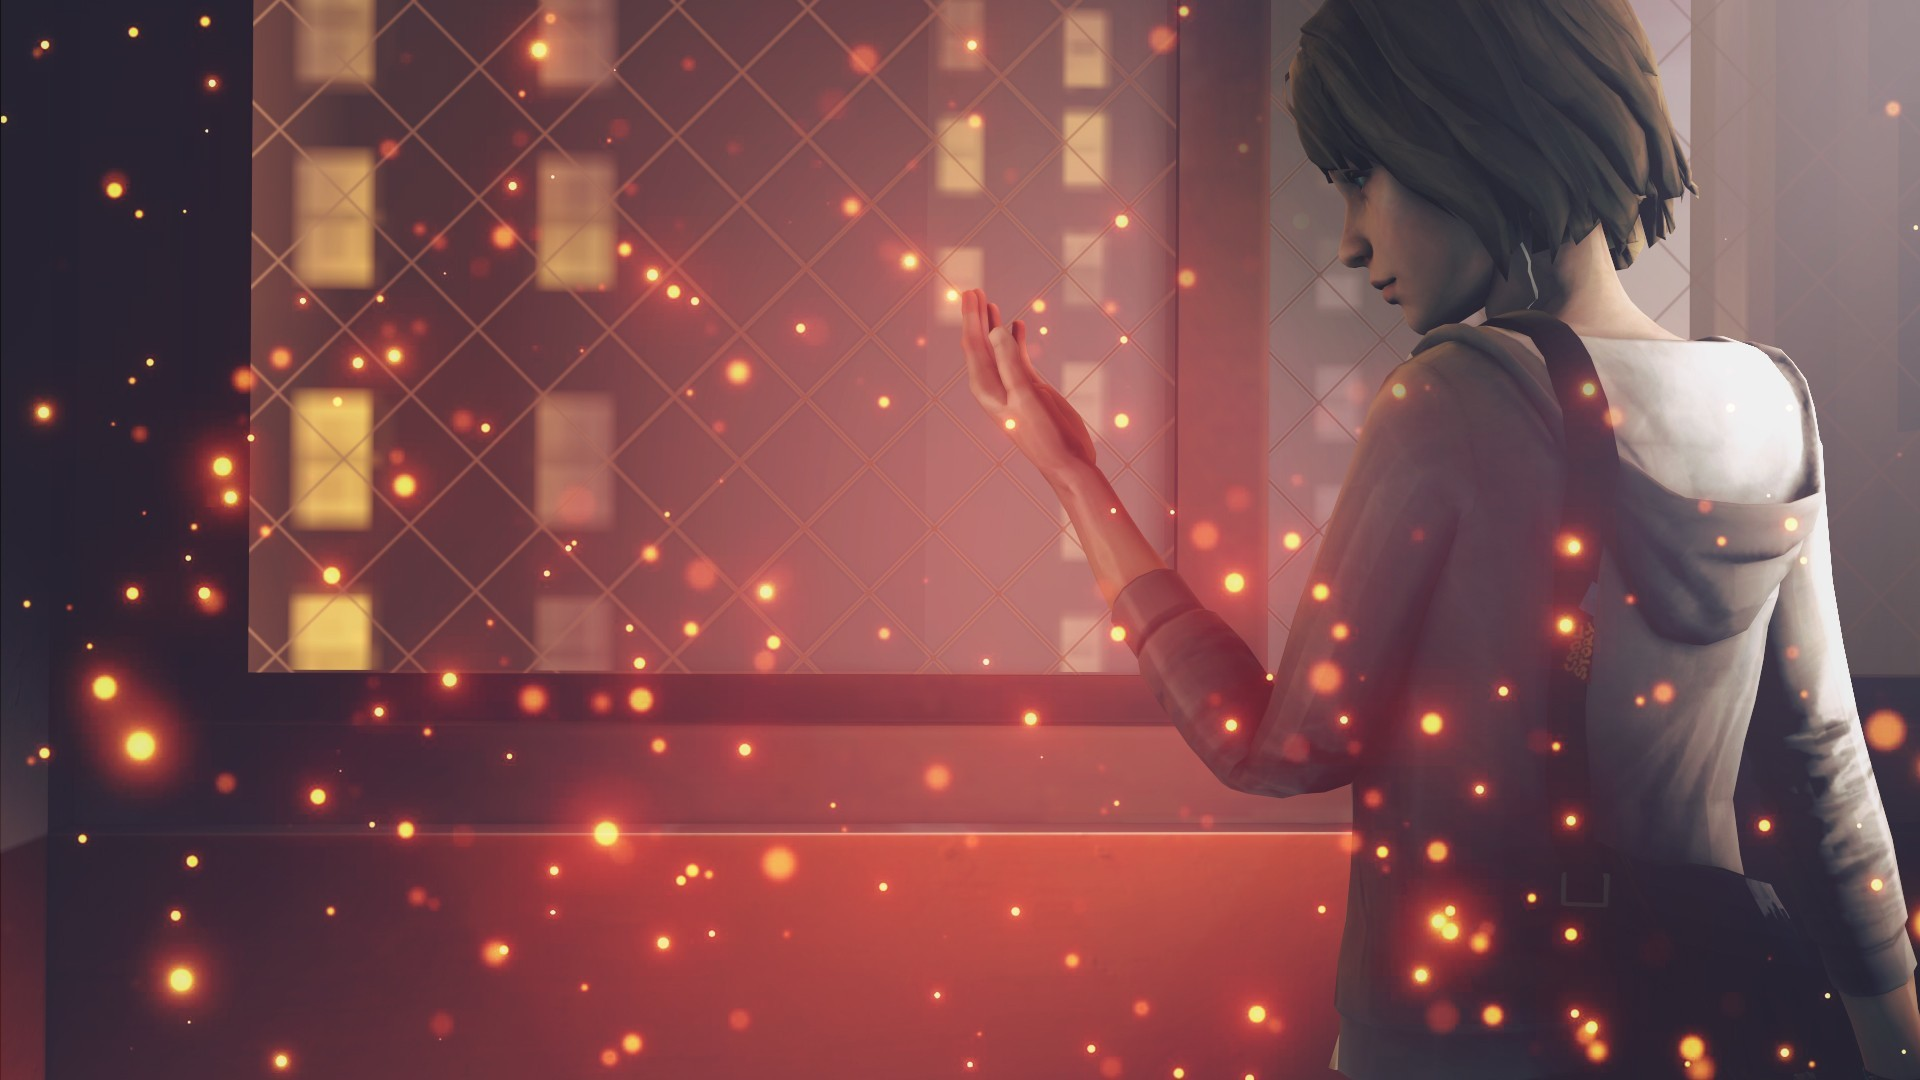 Life Is Strange 2 Episode 1 Wallpapers